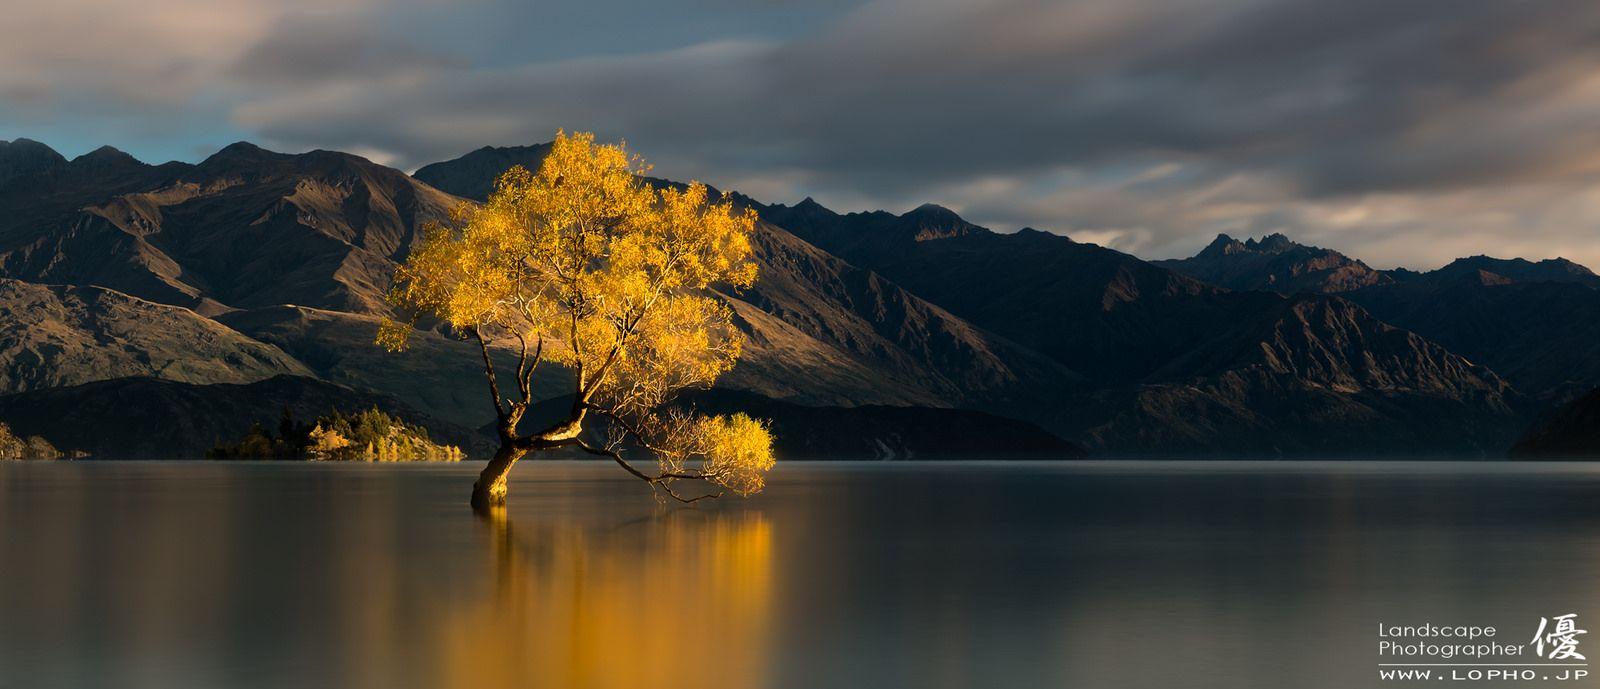 https://flic.kr/p/NZRVZP | Wanaka in New Zealand [Explore] | Wanaka in New Zealand